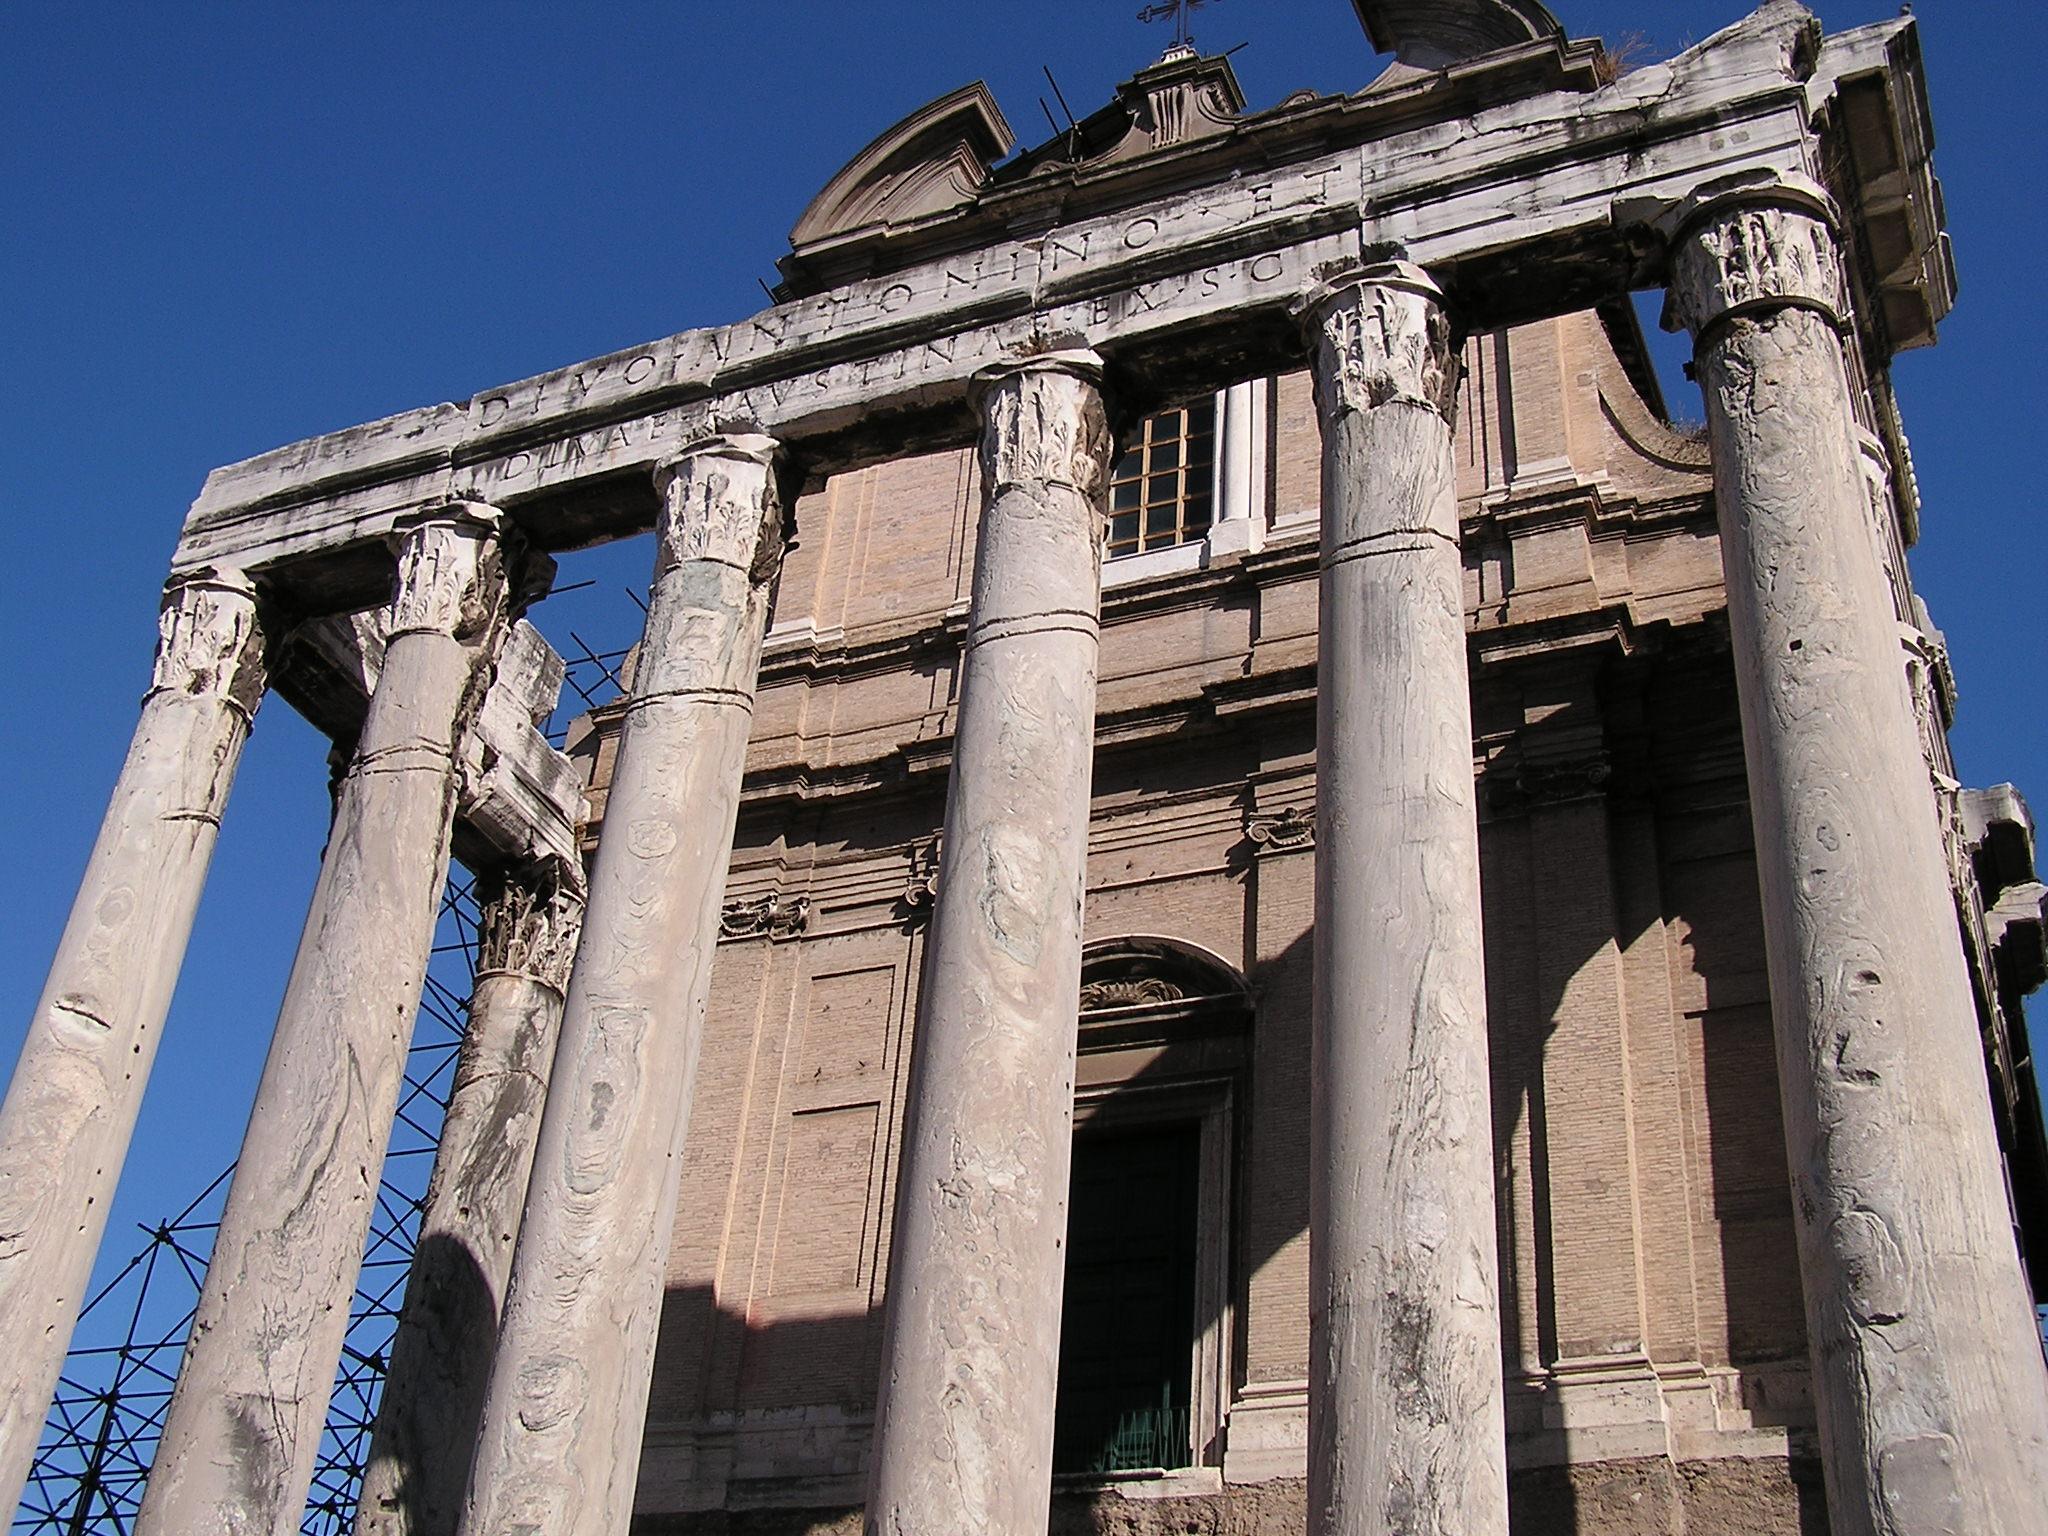 Temple of Divus Antoninus and Diva Faustina